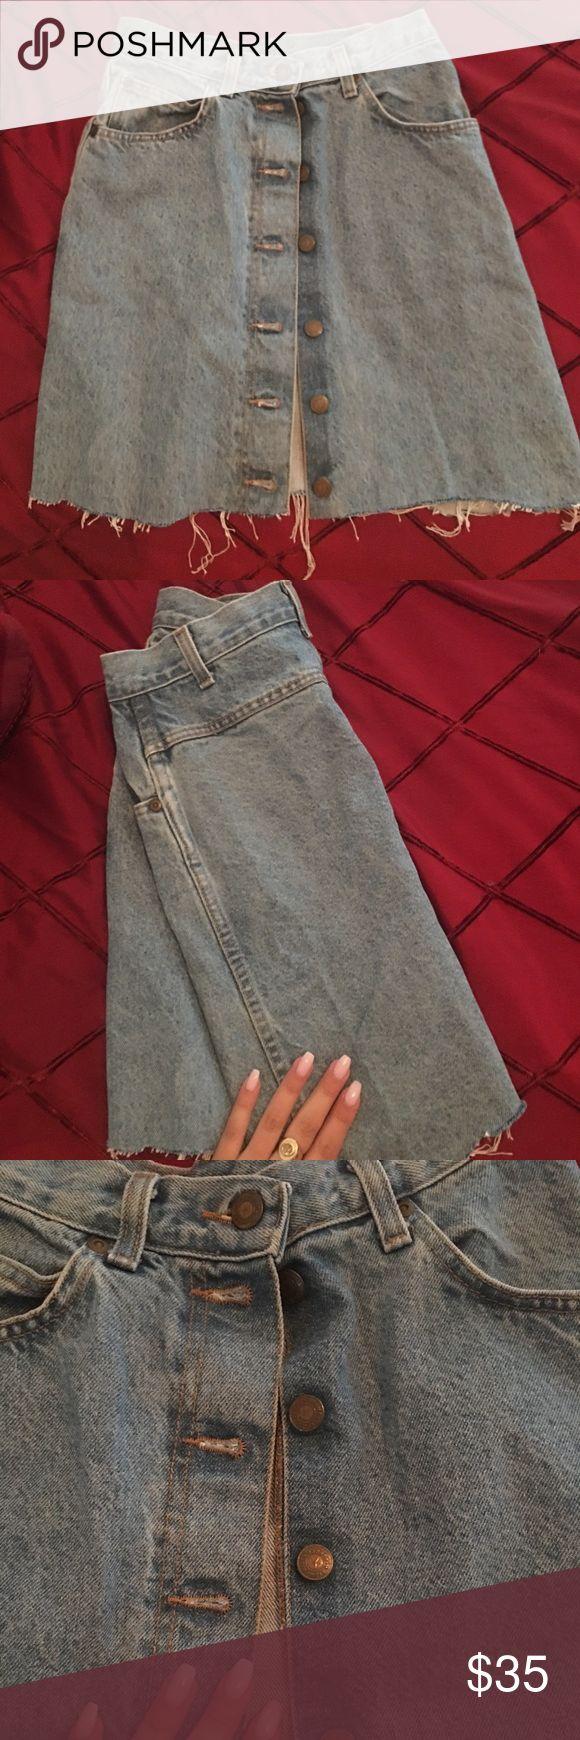 Vintage high waisted jean skirt Vintage high waisted jean skirt! Super cute! Size S 💙 Vivaldi Skirts High Low